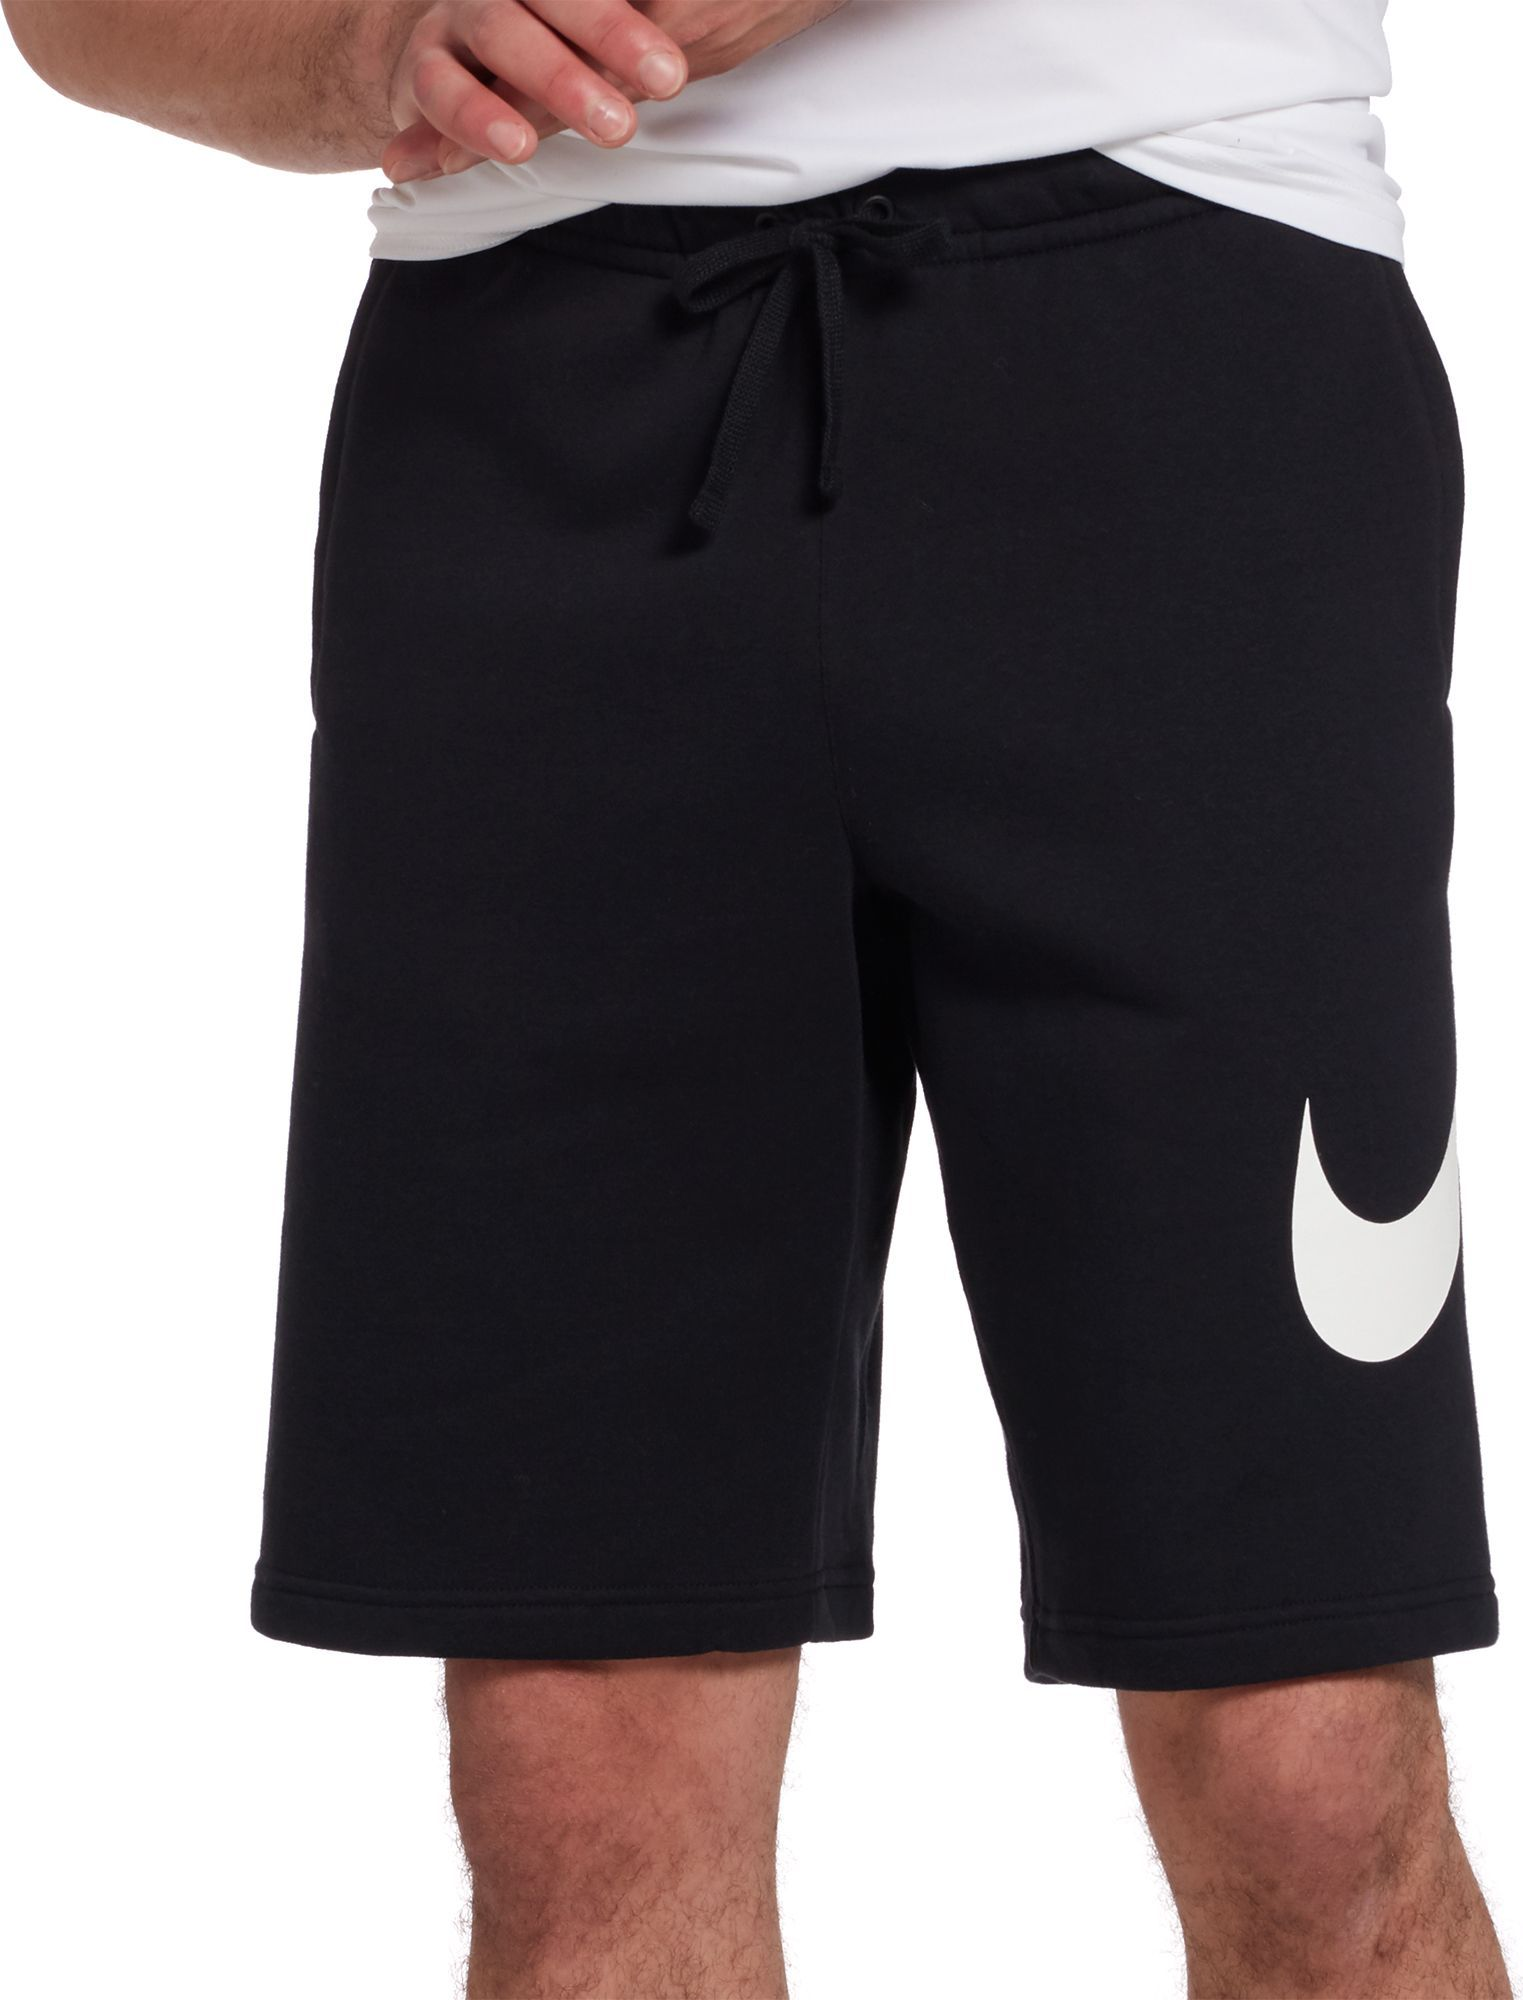 FZ Merchandise - Nike Men's Sportswear Club Fleece Sweatshorts,  Black/White, Medium - Walmart.com